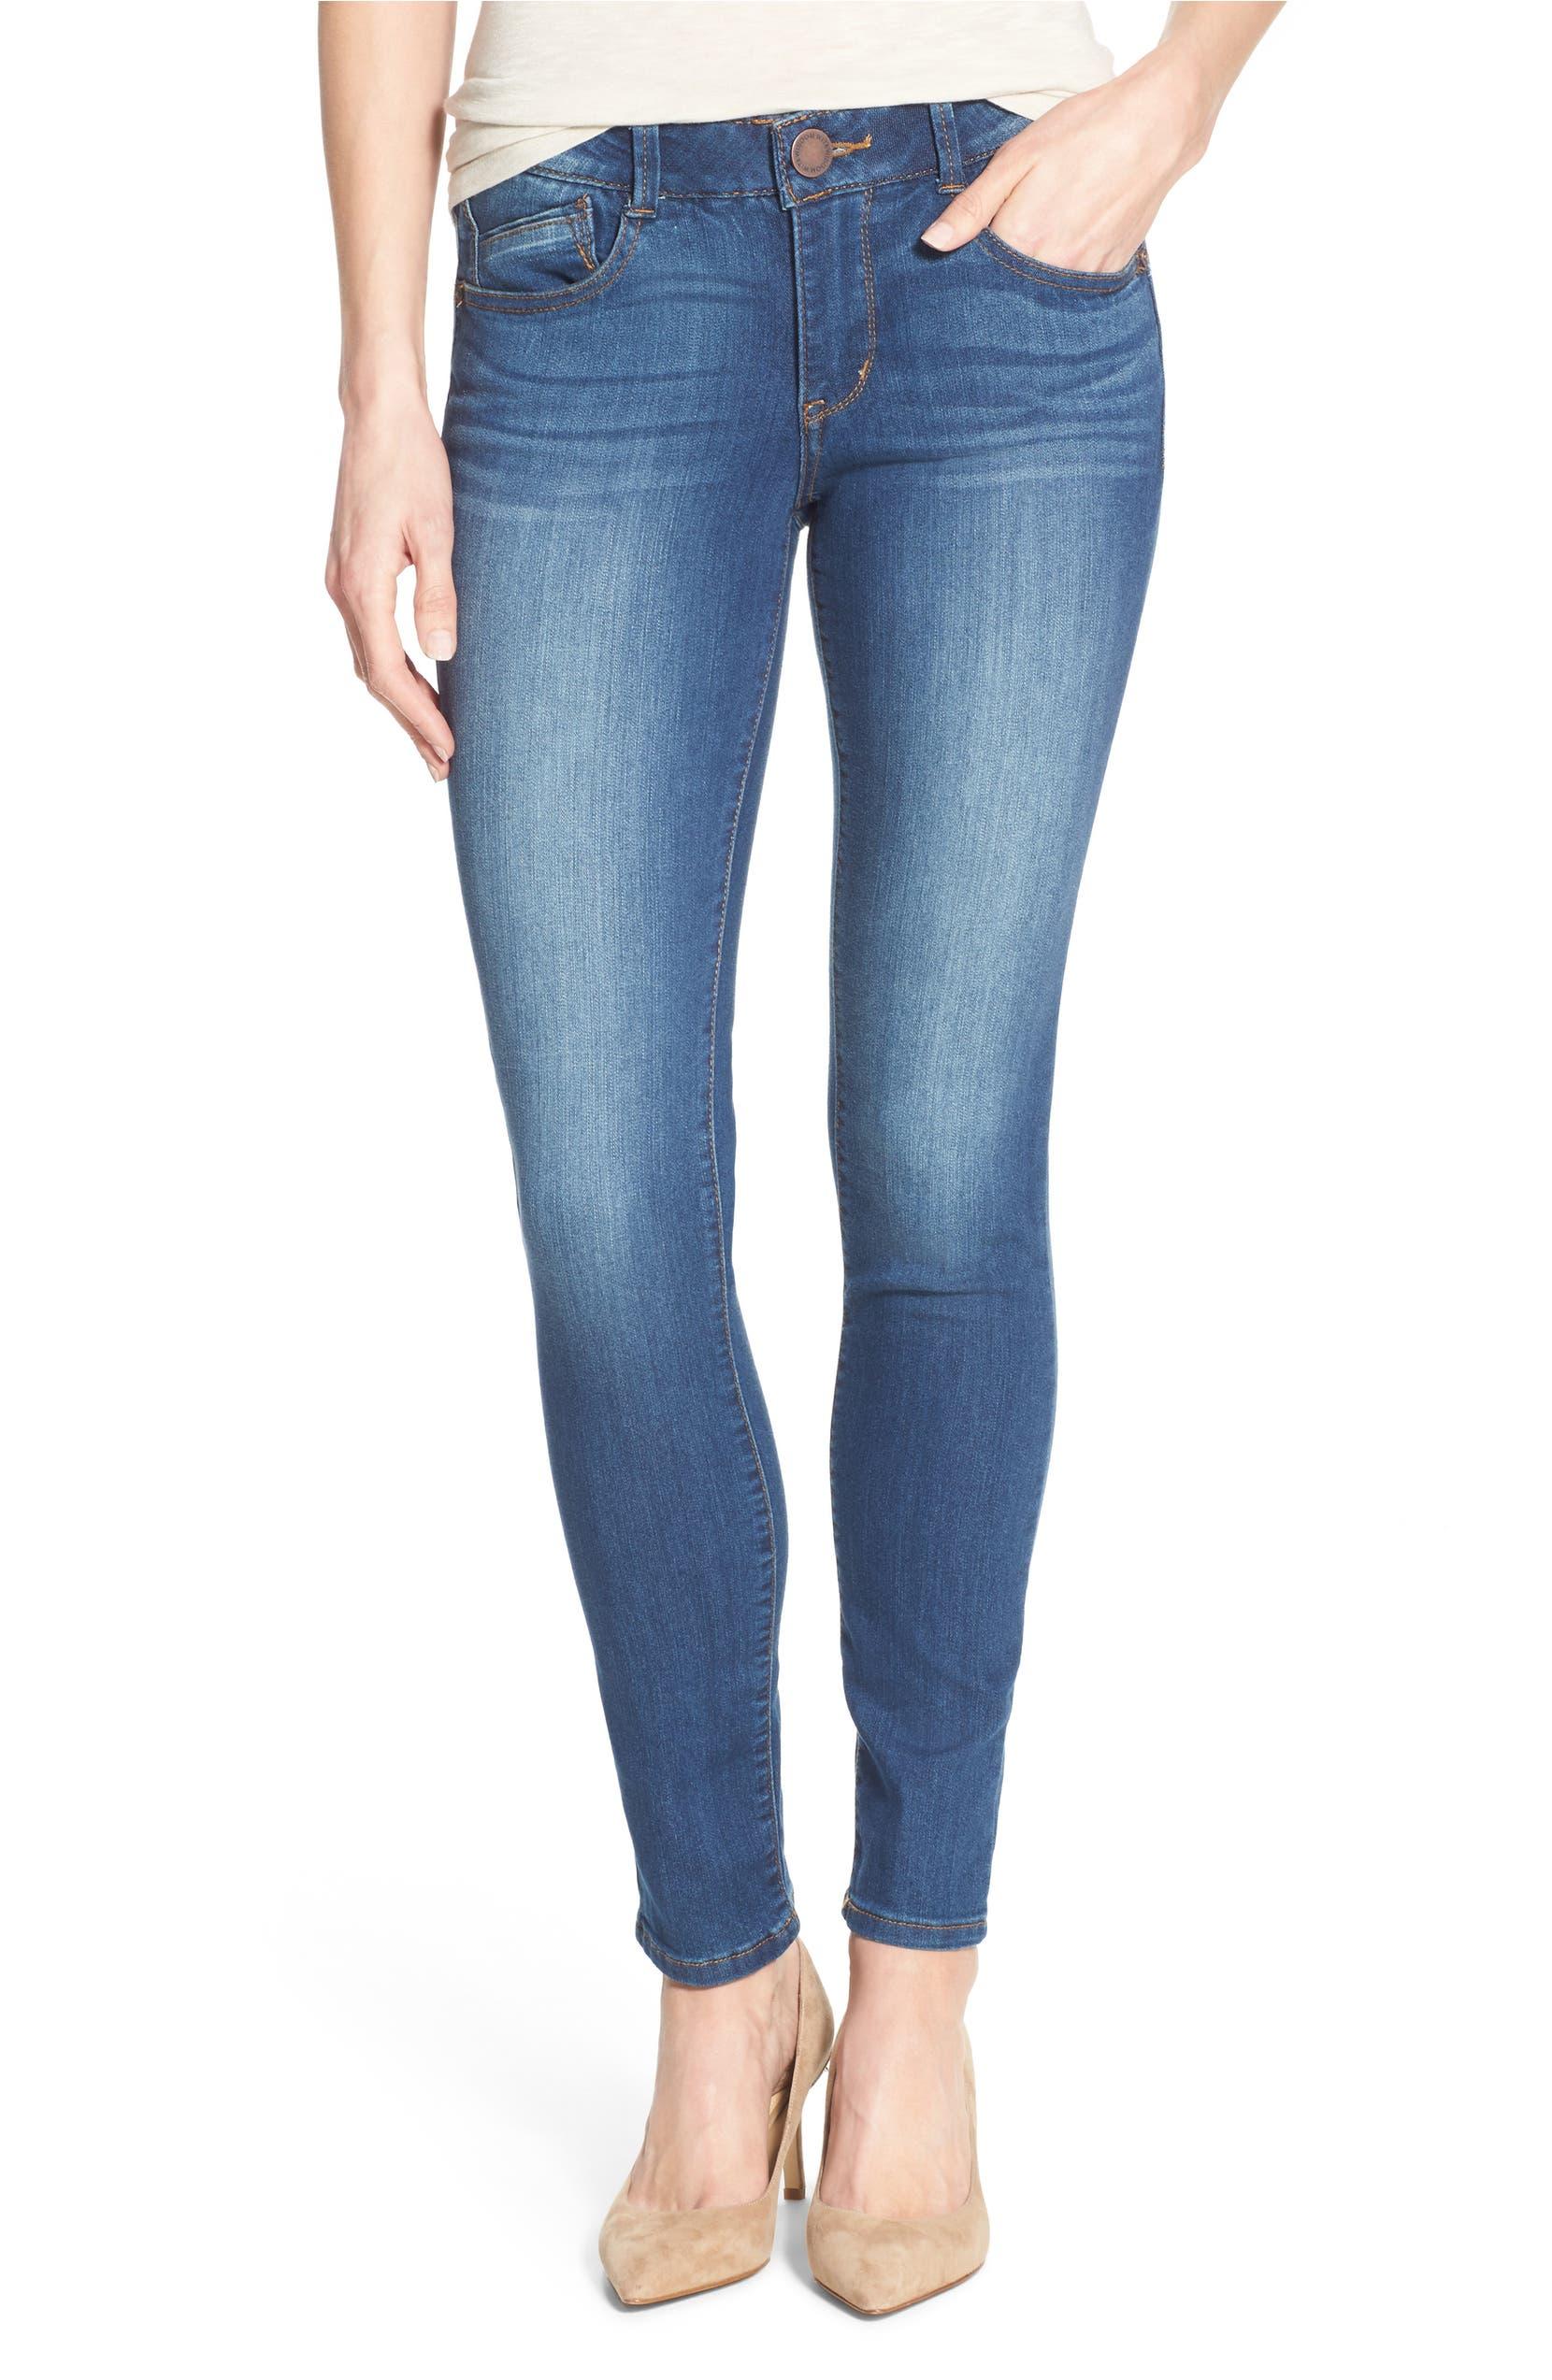 5ffdc095c68 Wit & Wisdom Ab-solution Stretch Skinny Jeans (Regular & Petite) (Nordstrom  Exclusive) | Nordstrom